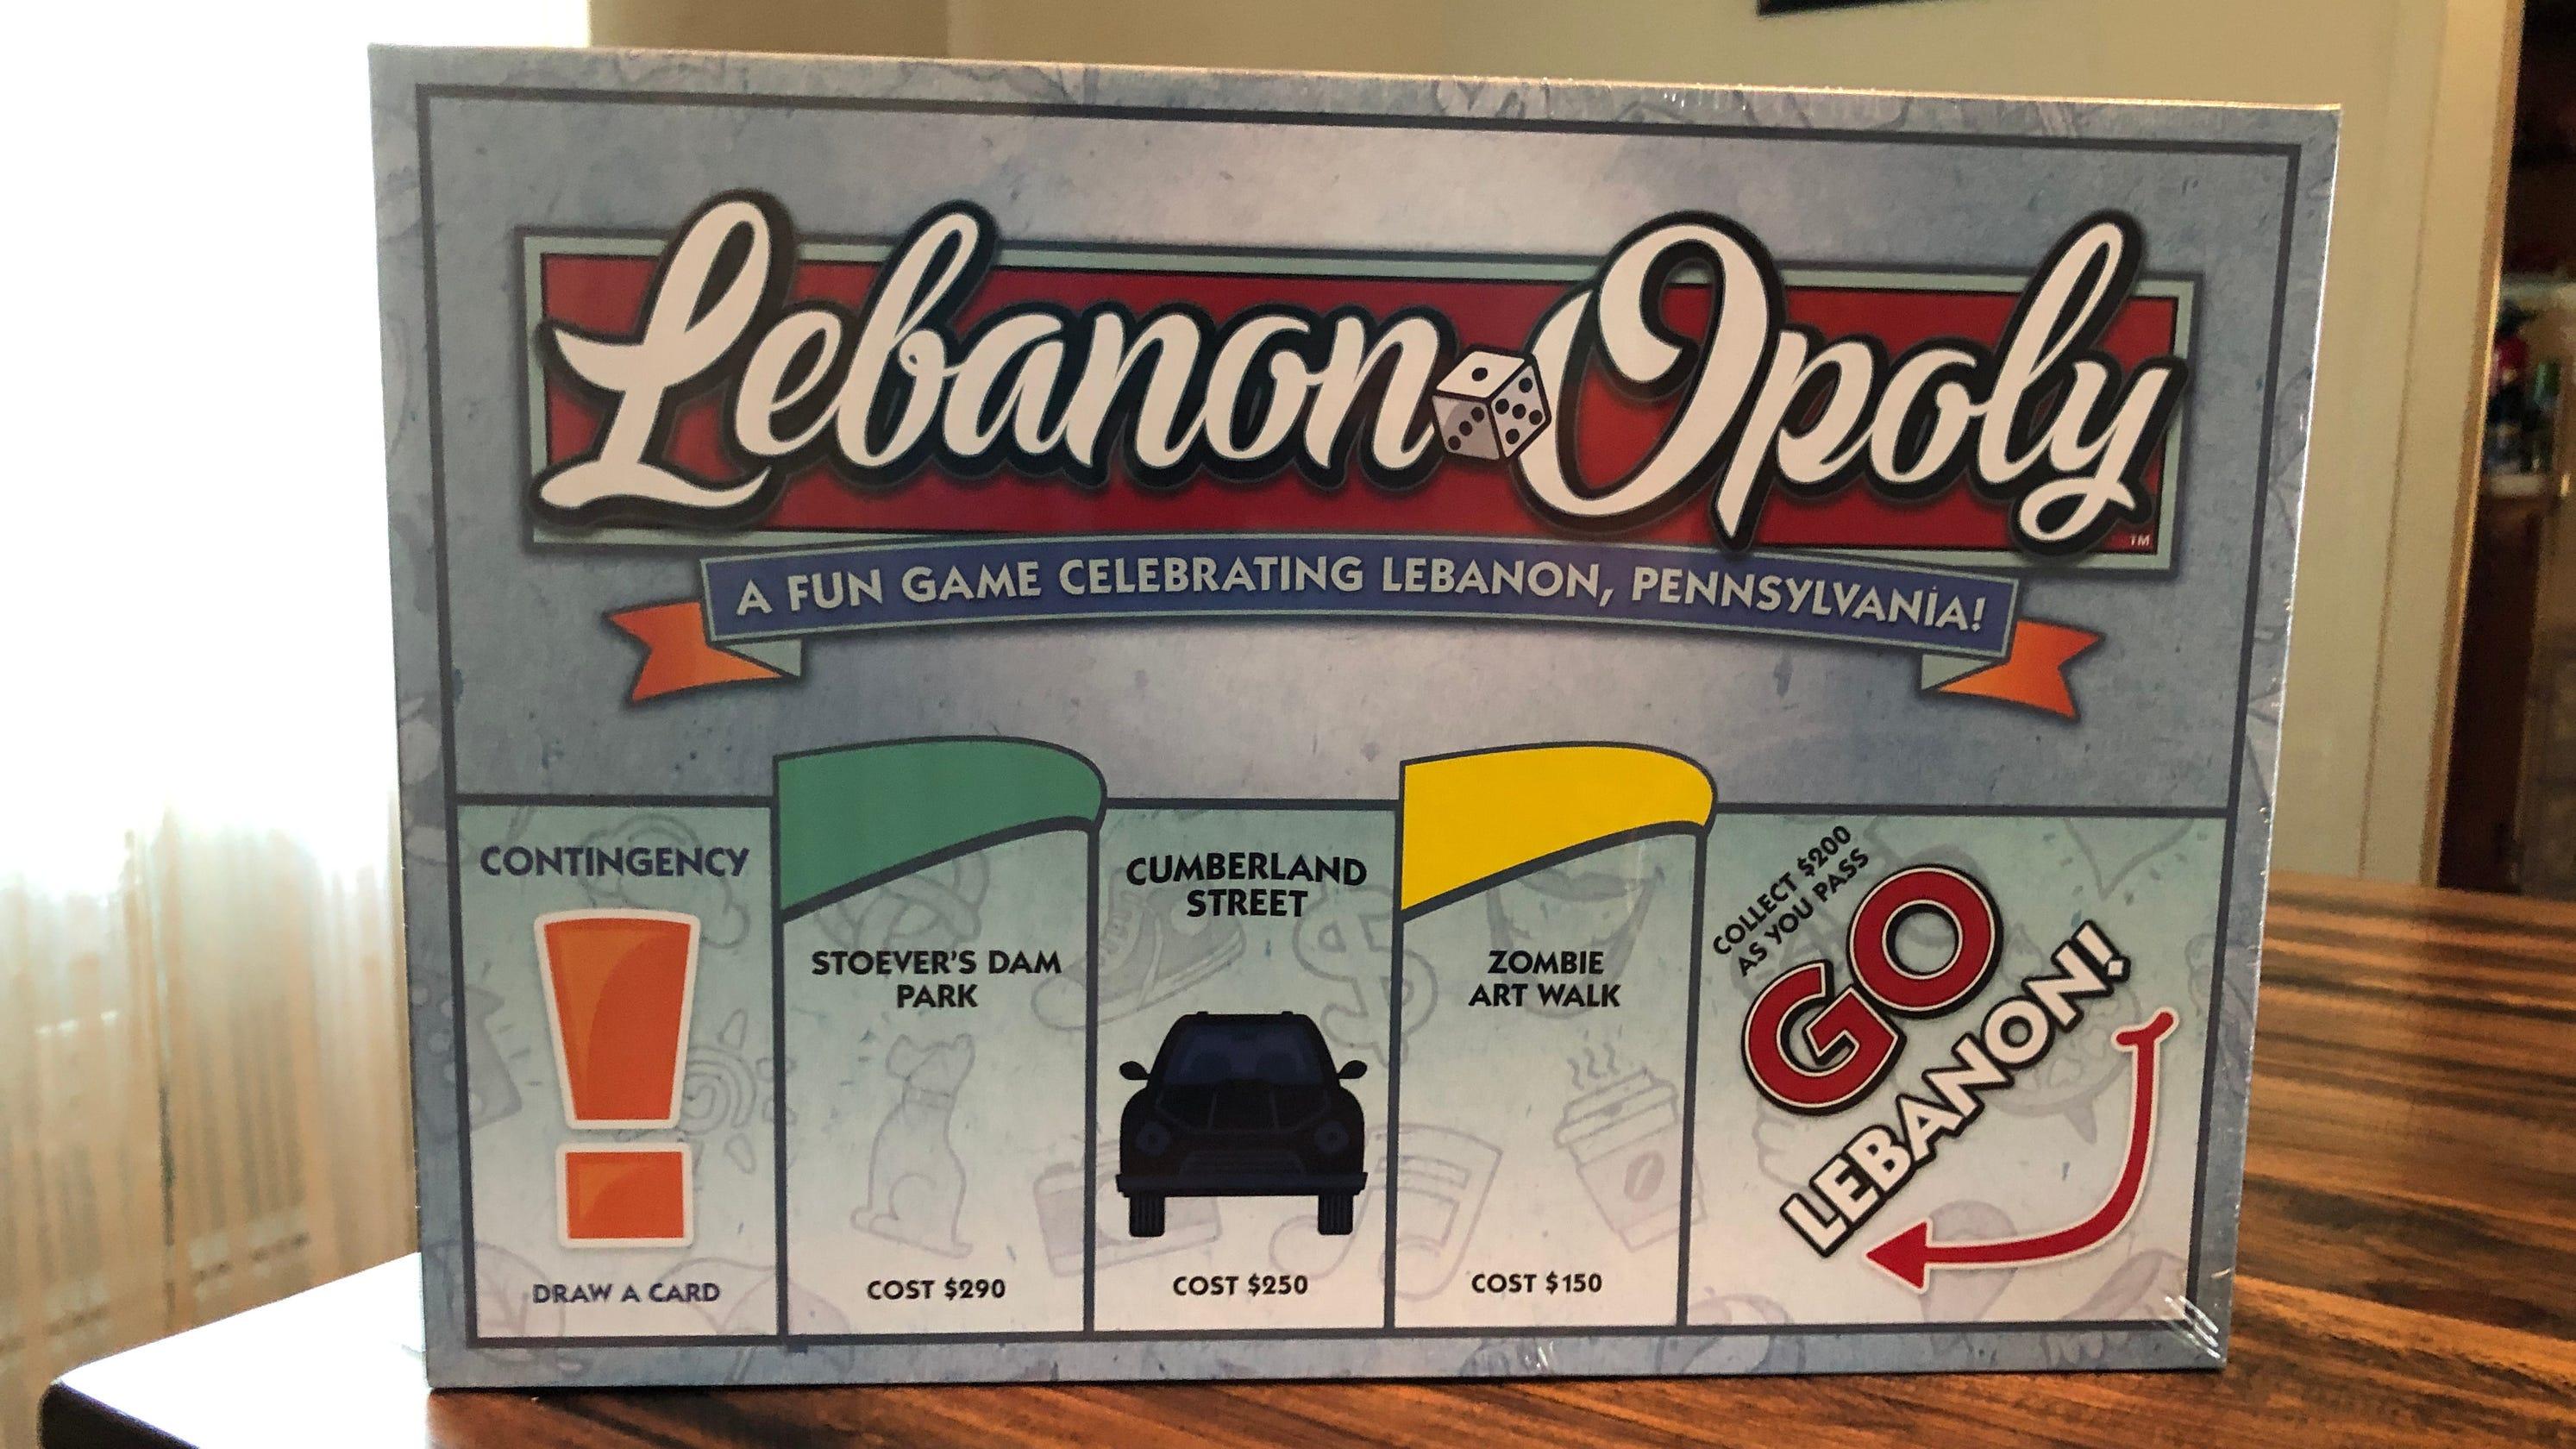 Monopoly imitation, Lebanon-Opoly, now on sale at Walmart